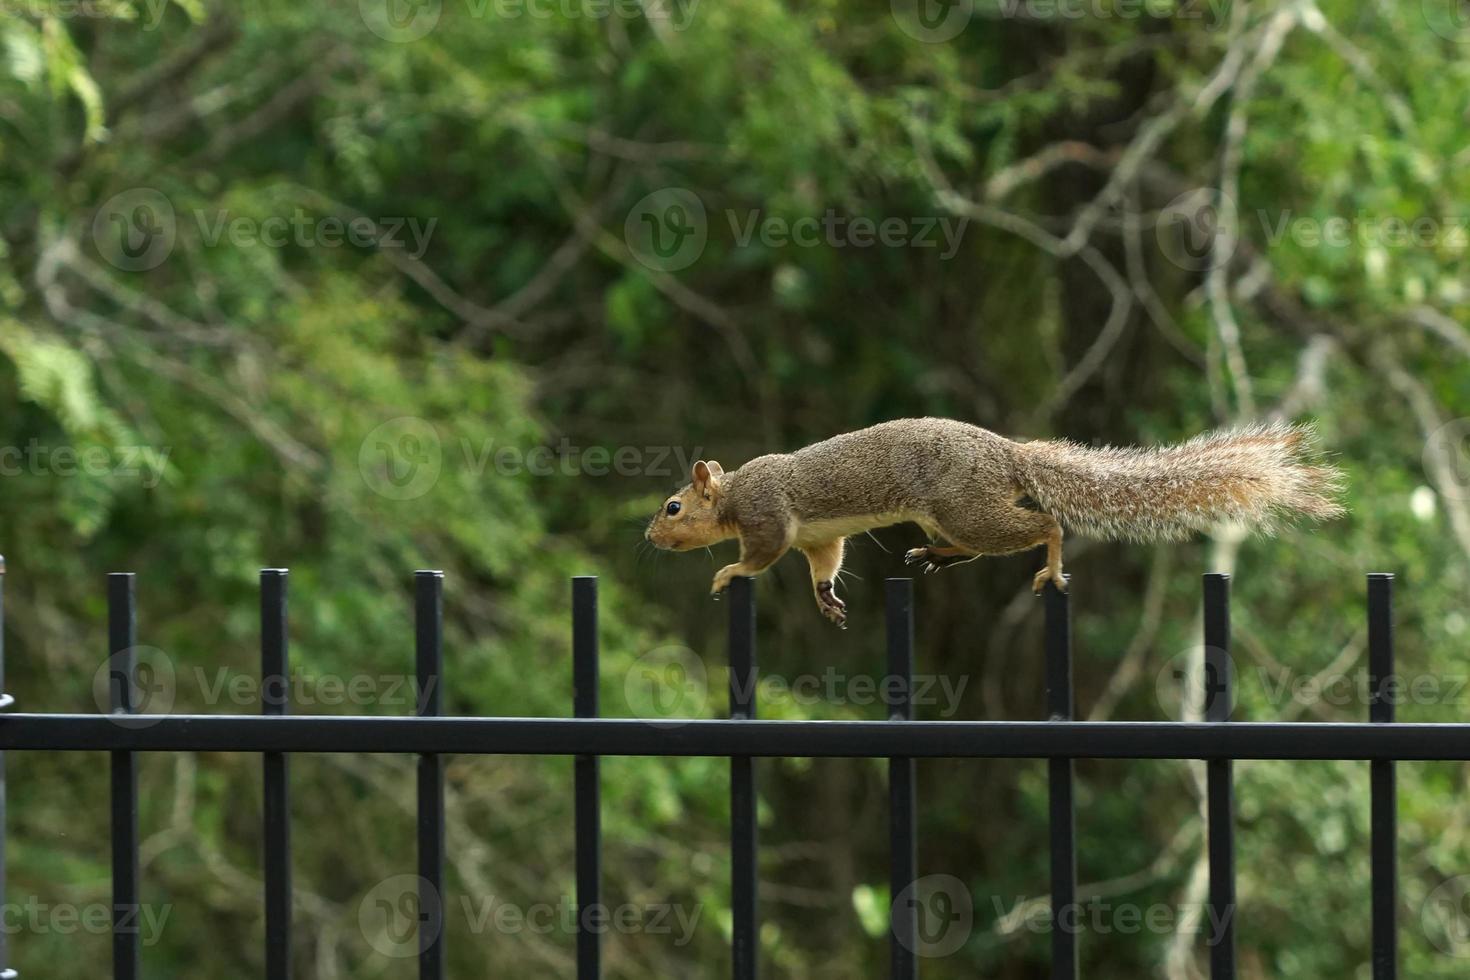 Squirrel on the run photo